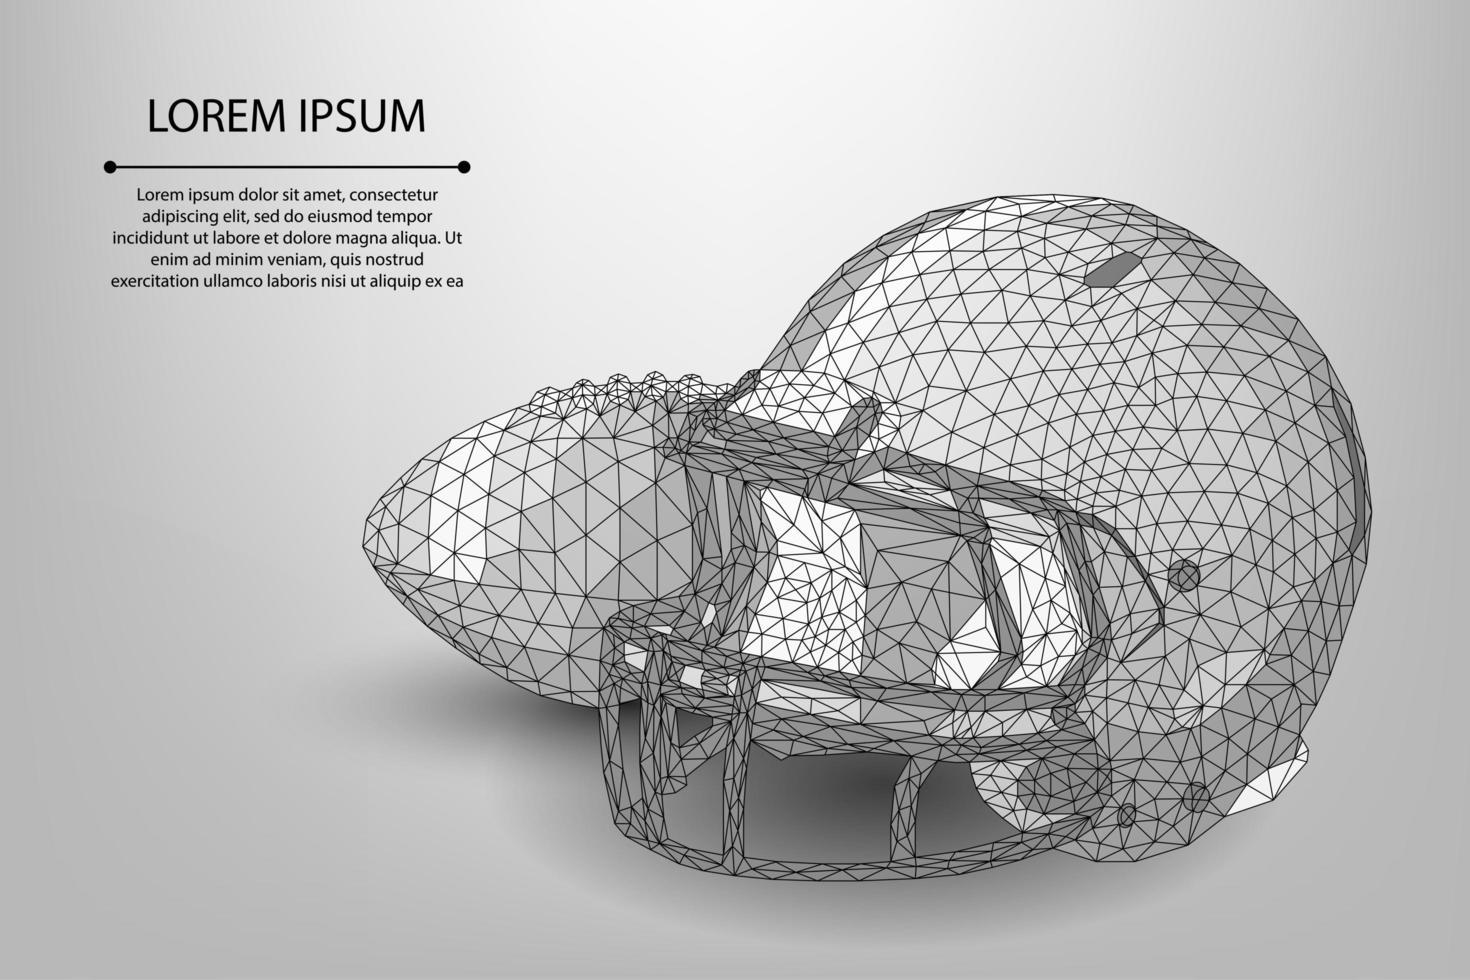 Pelota y casco de fútbol americano de baja poli línea o rugby vector